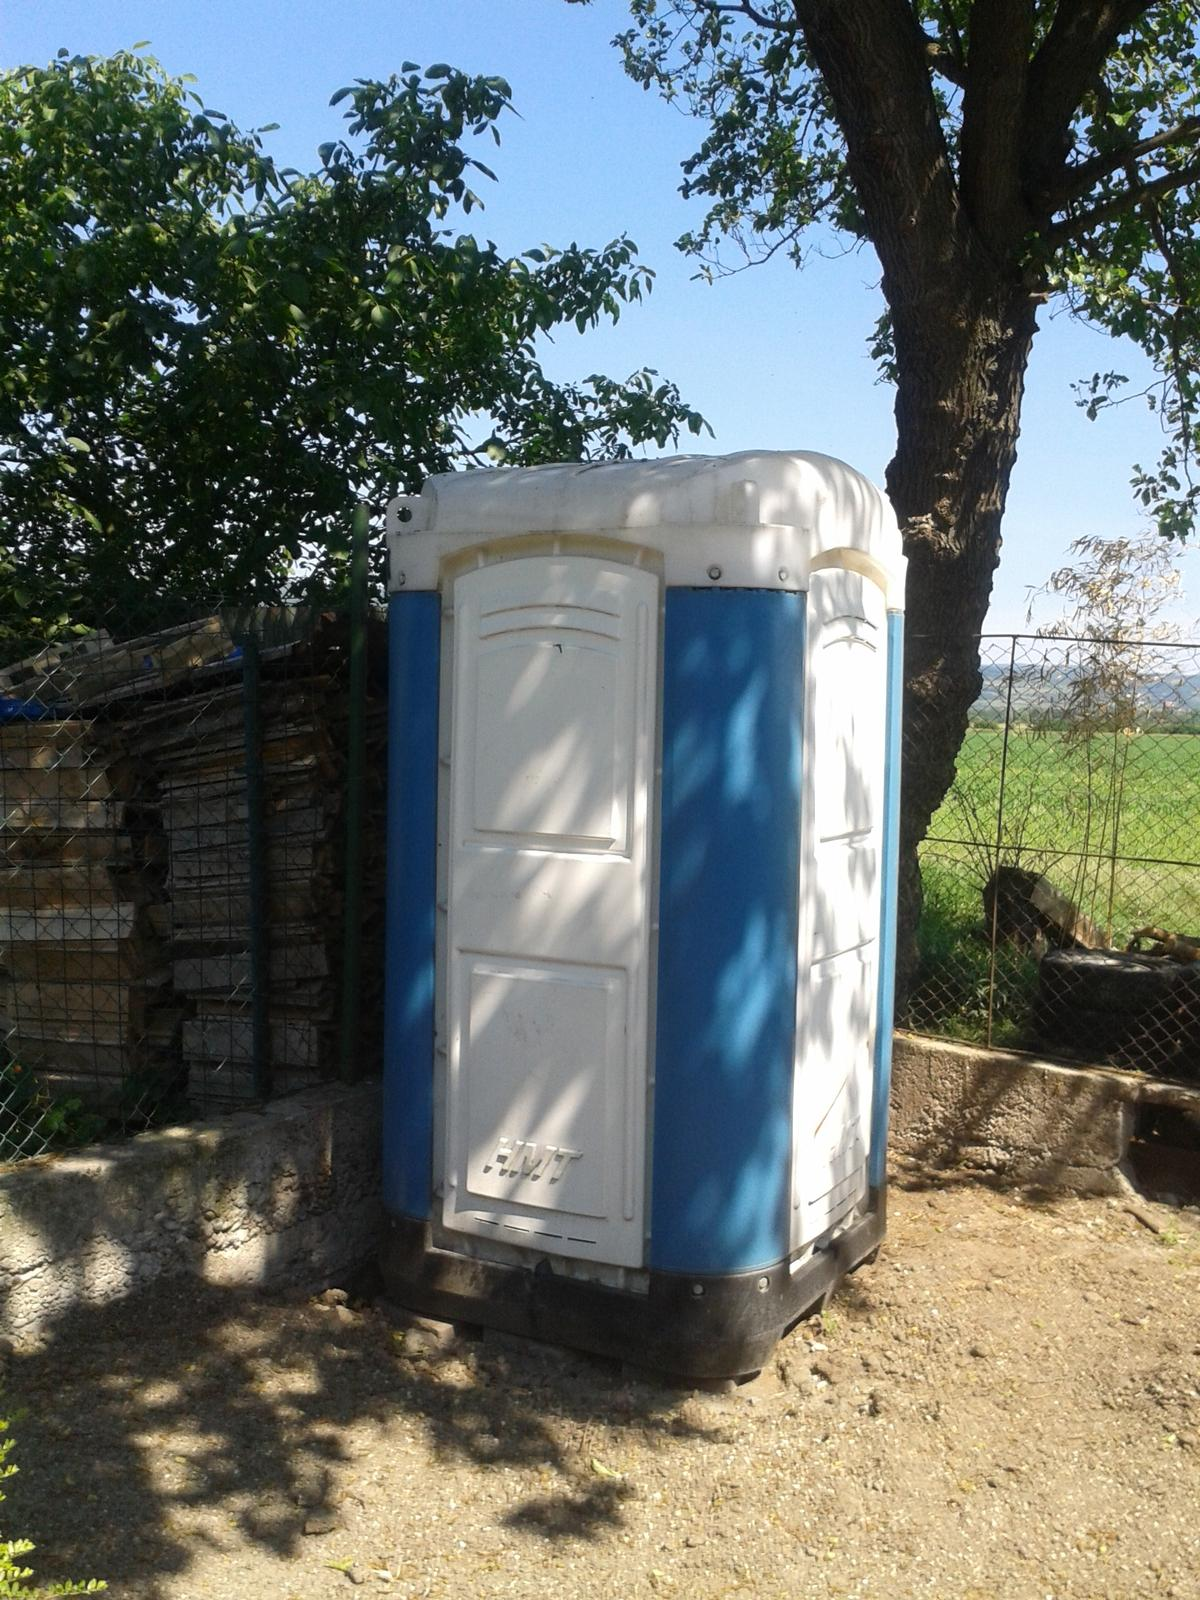 mobiln wc toi toi 300 baz r pre b vanie. Black Bedroom Furniture Sets. Home Design Ideas